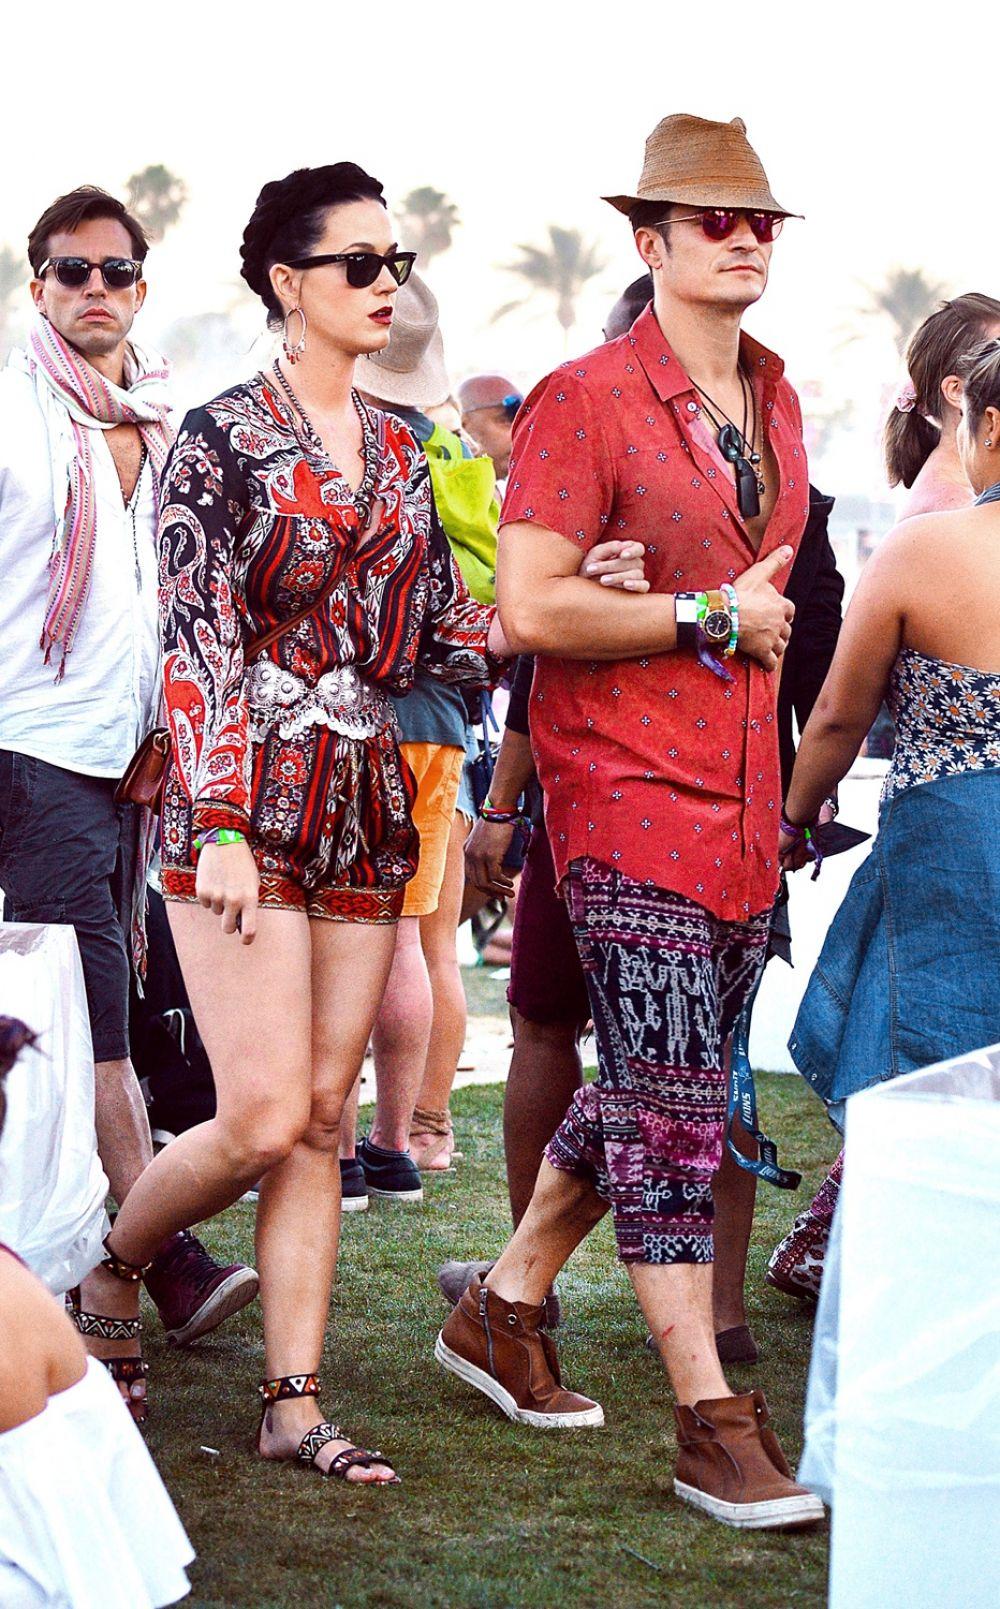 Katy Perry At Coachella In Indio 04 17 2016 Hawtcelebs